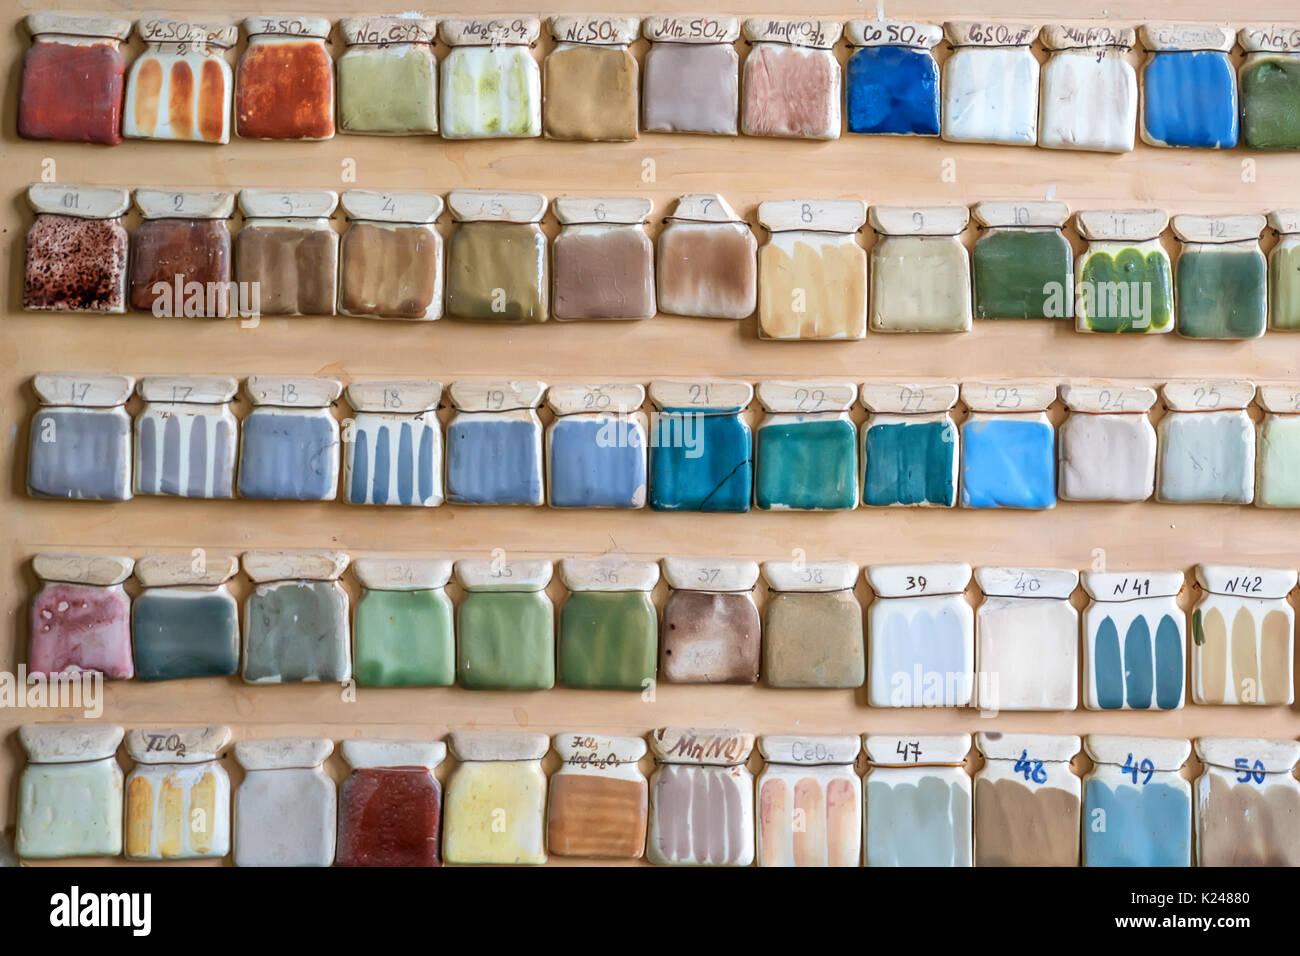 Topferei Farbmuster Auf Wand Stockfoto Bild 156216928 Alamy